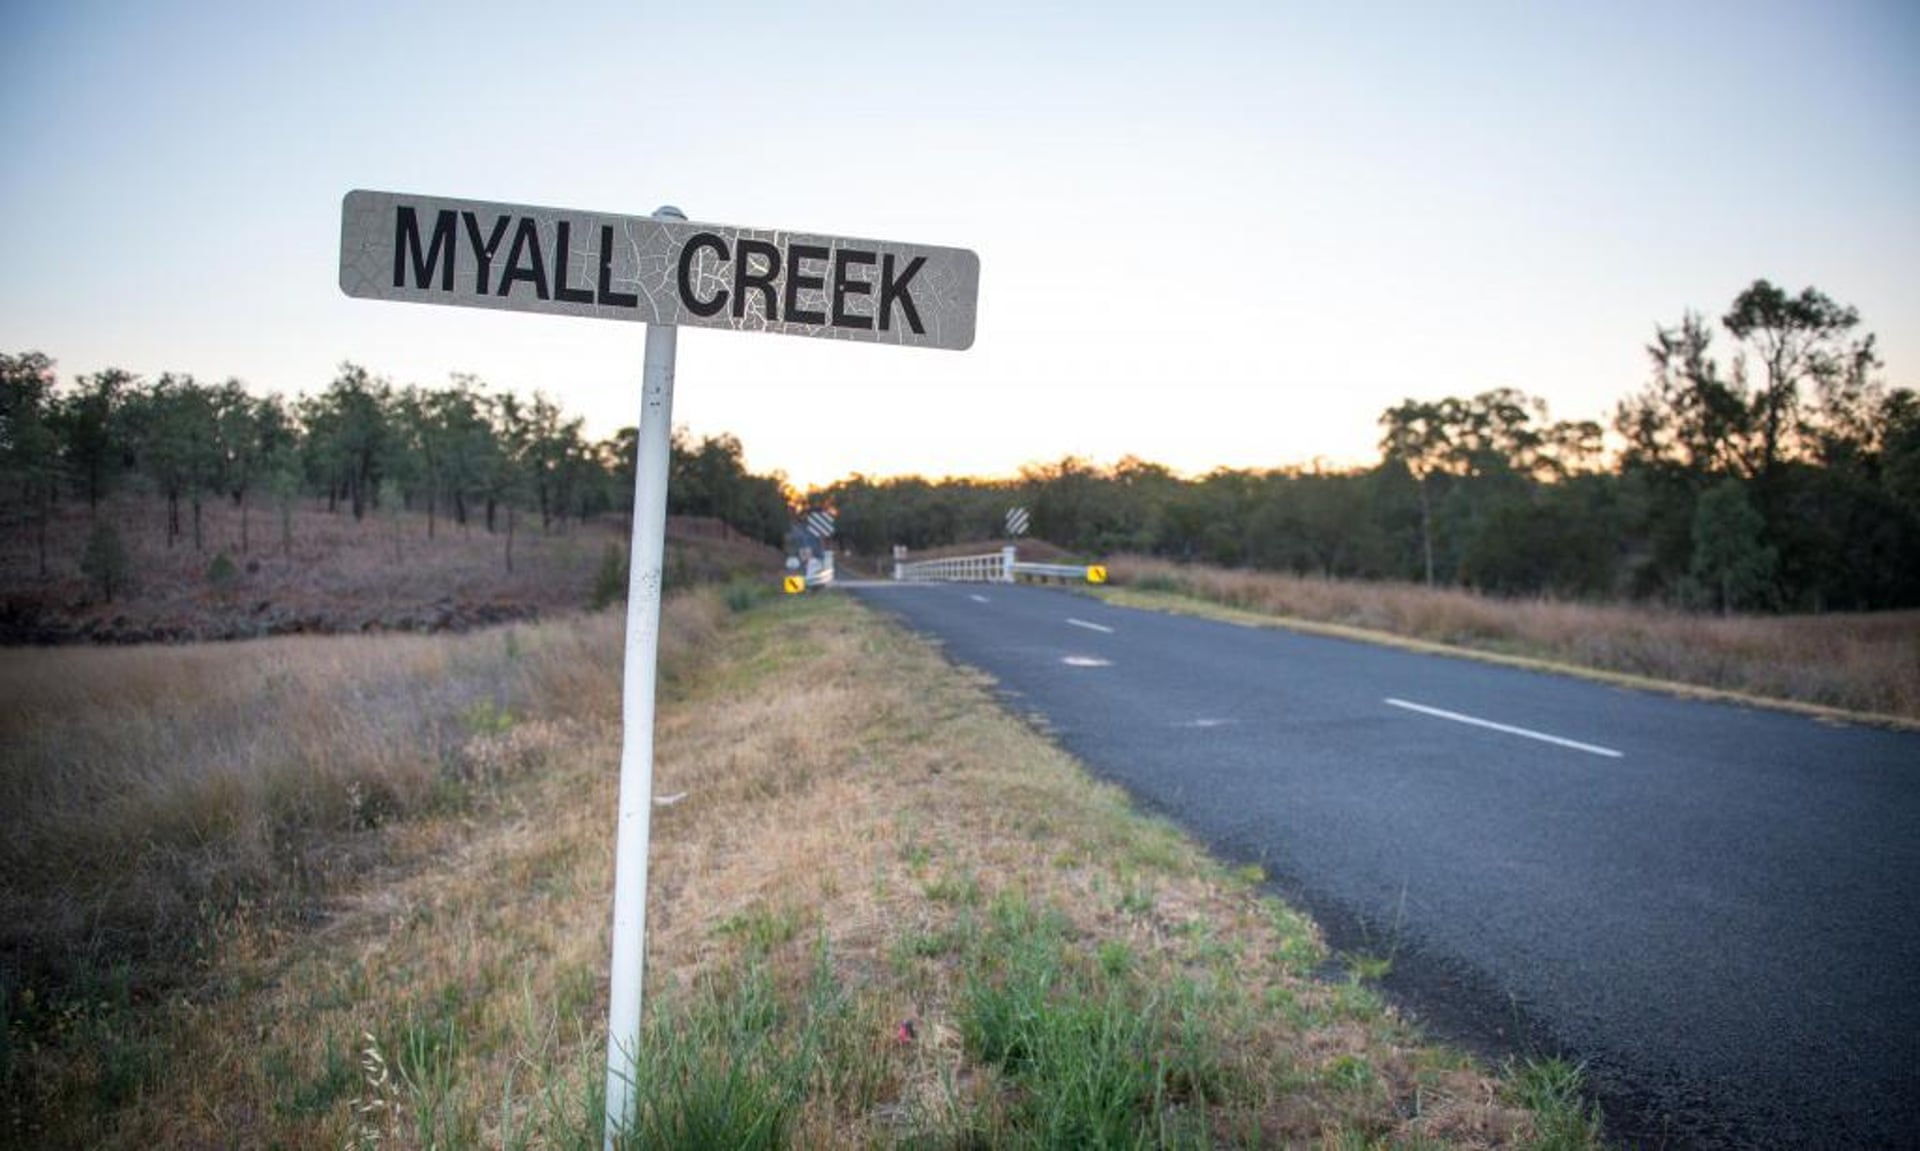 Myall Creek